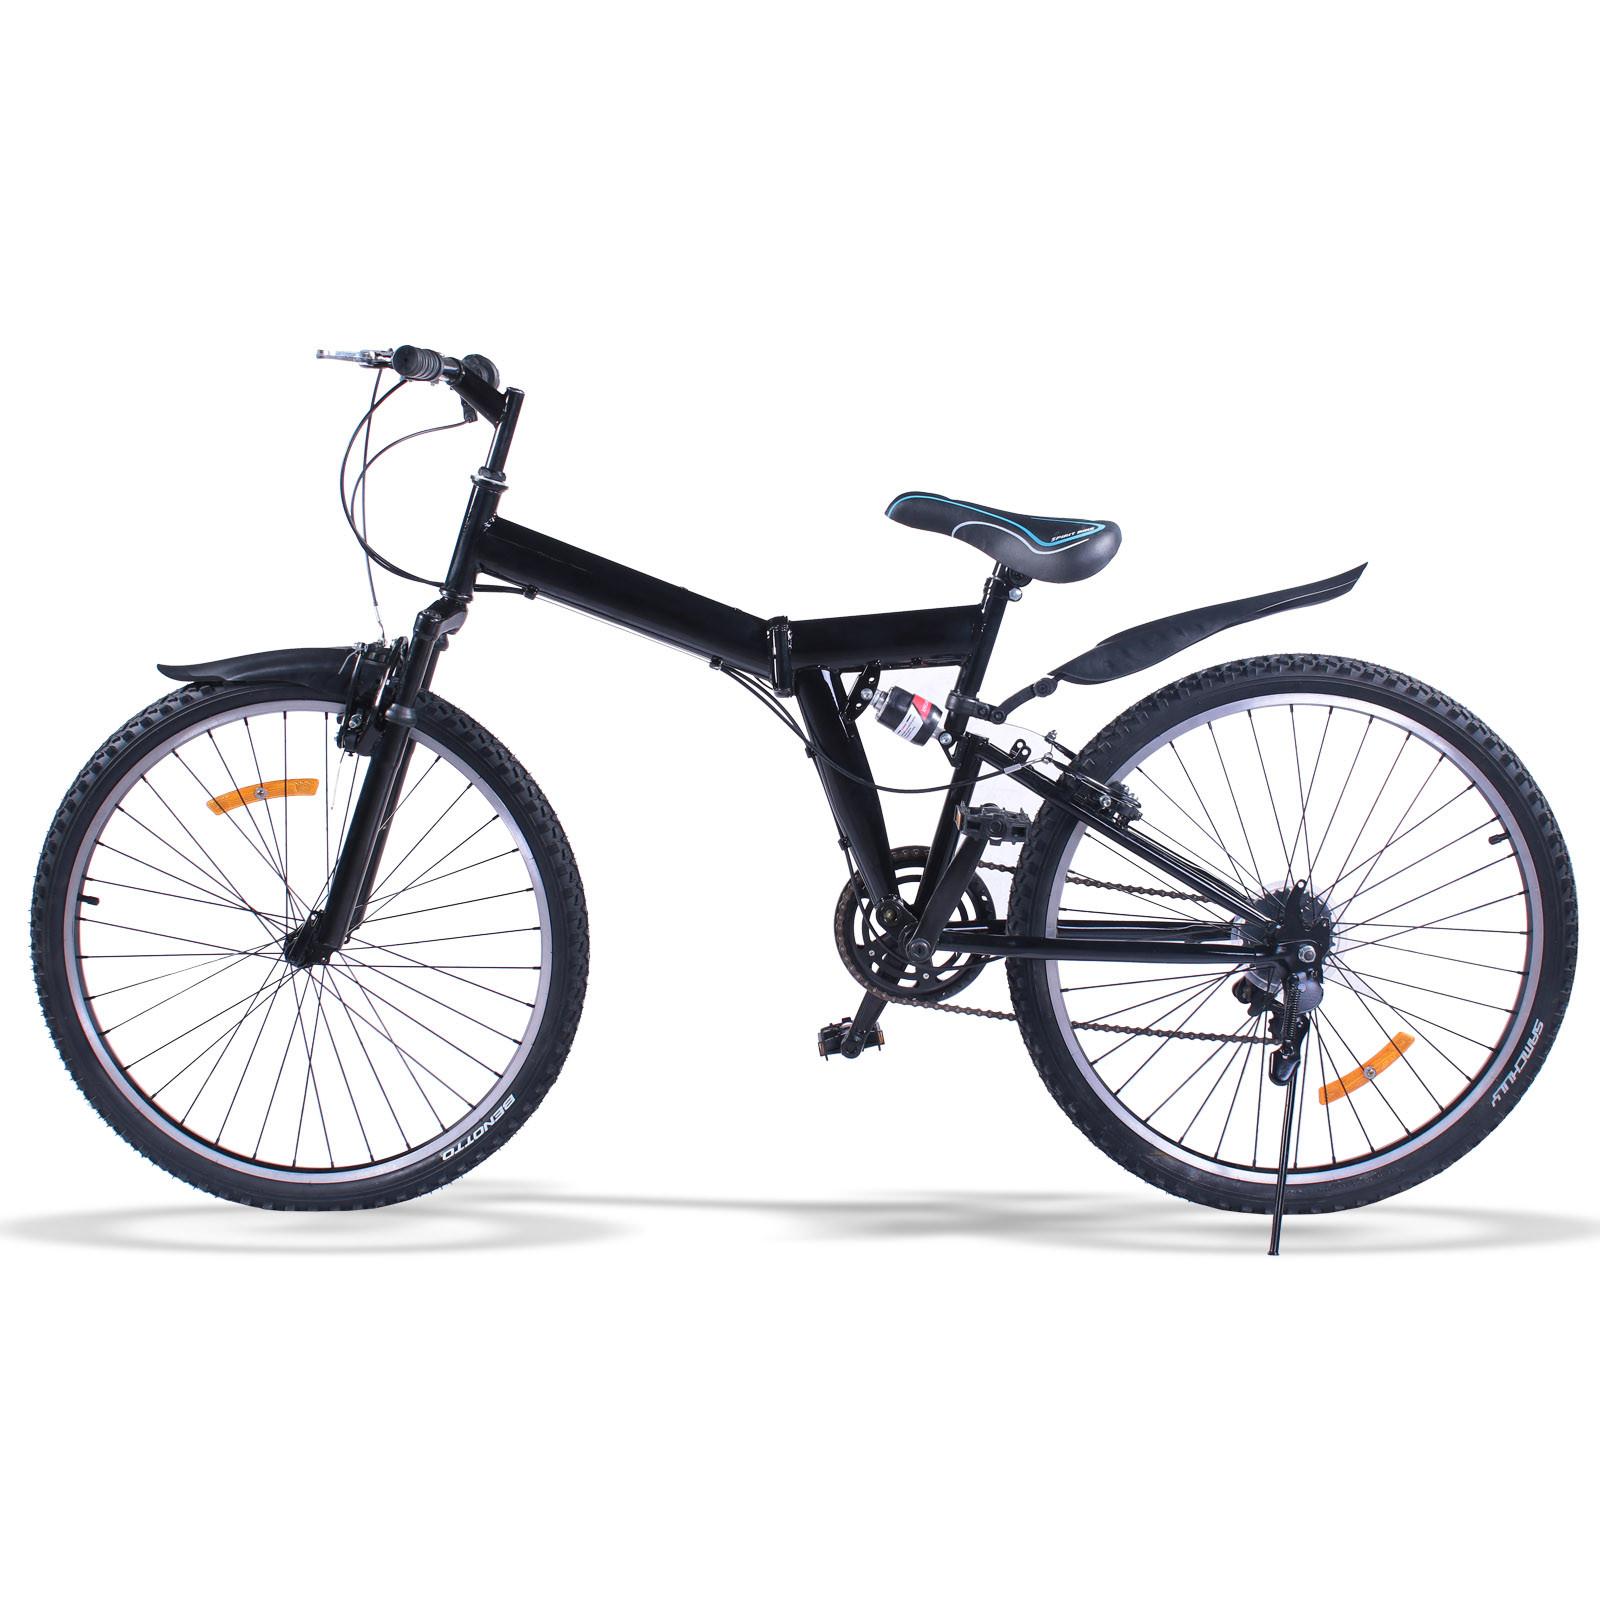 vtt 26 mountainbike 6 vitesse v lo pliant shimano adulte frein disque ebay. Black Bedroom Furniture Sets. Home Design Ideas